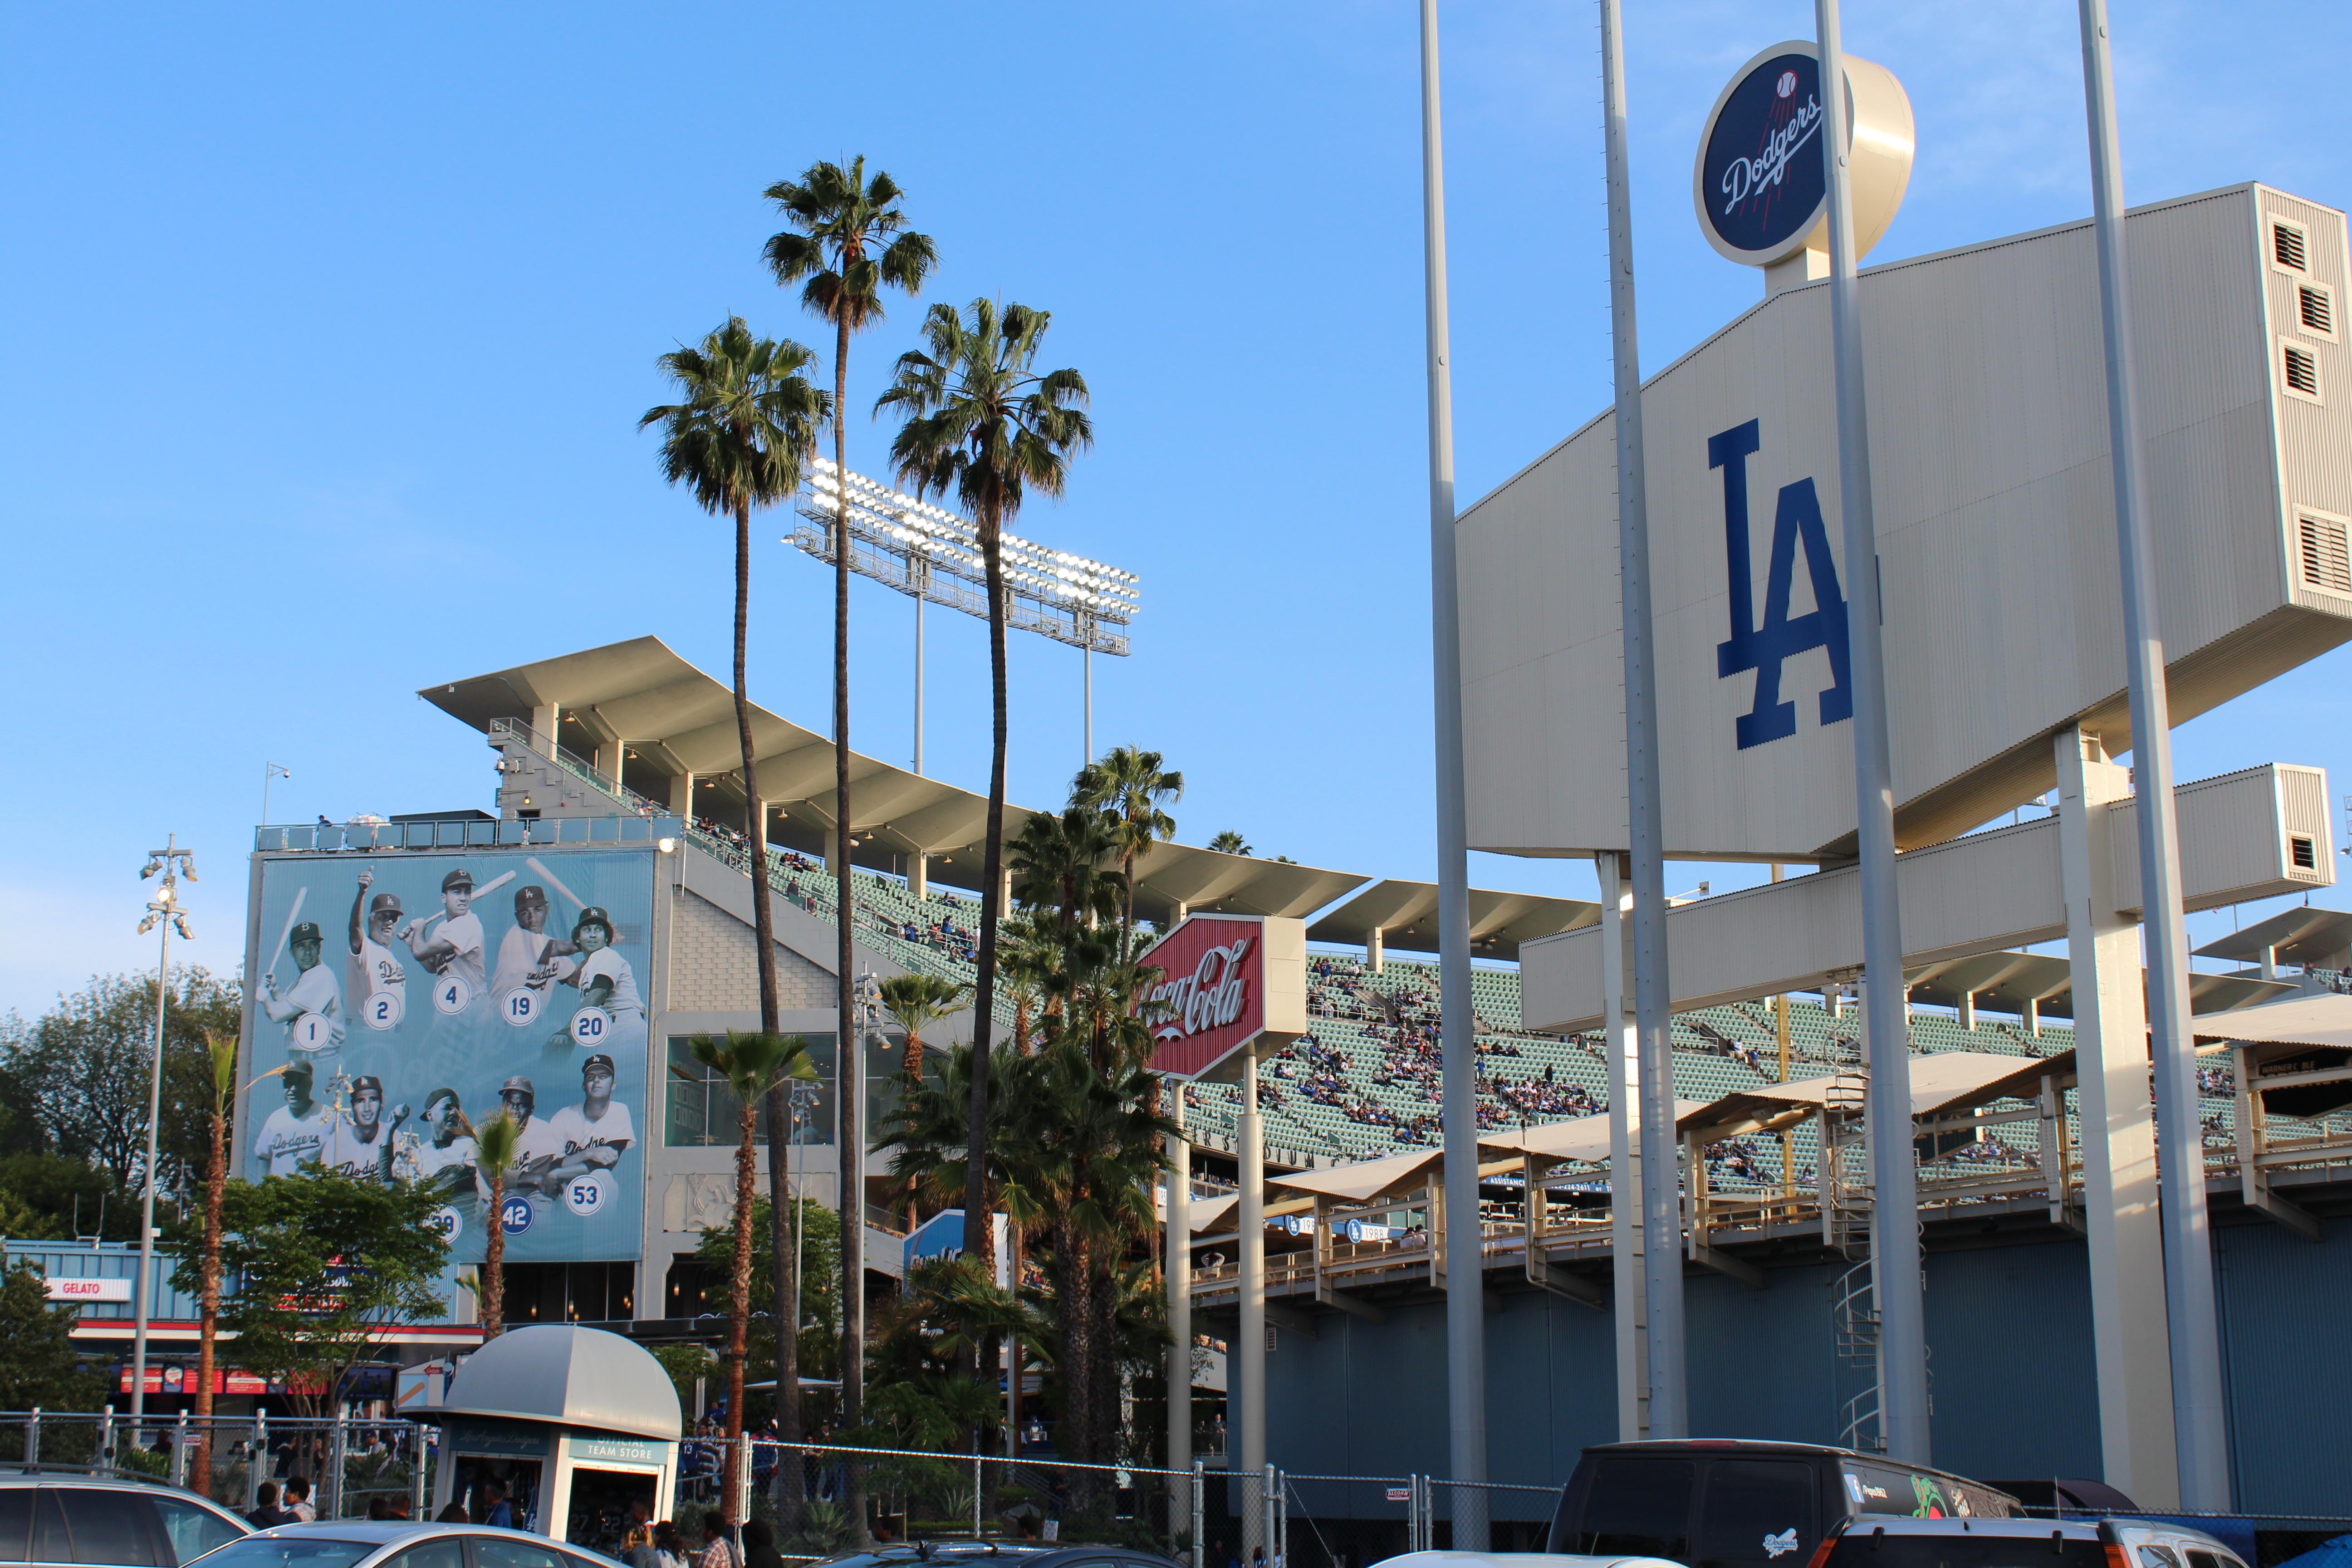 Dodger Stadium,West Coast Tour,Baseball stadium tours